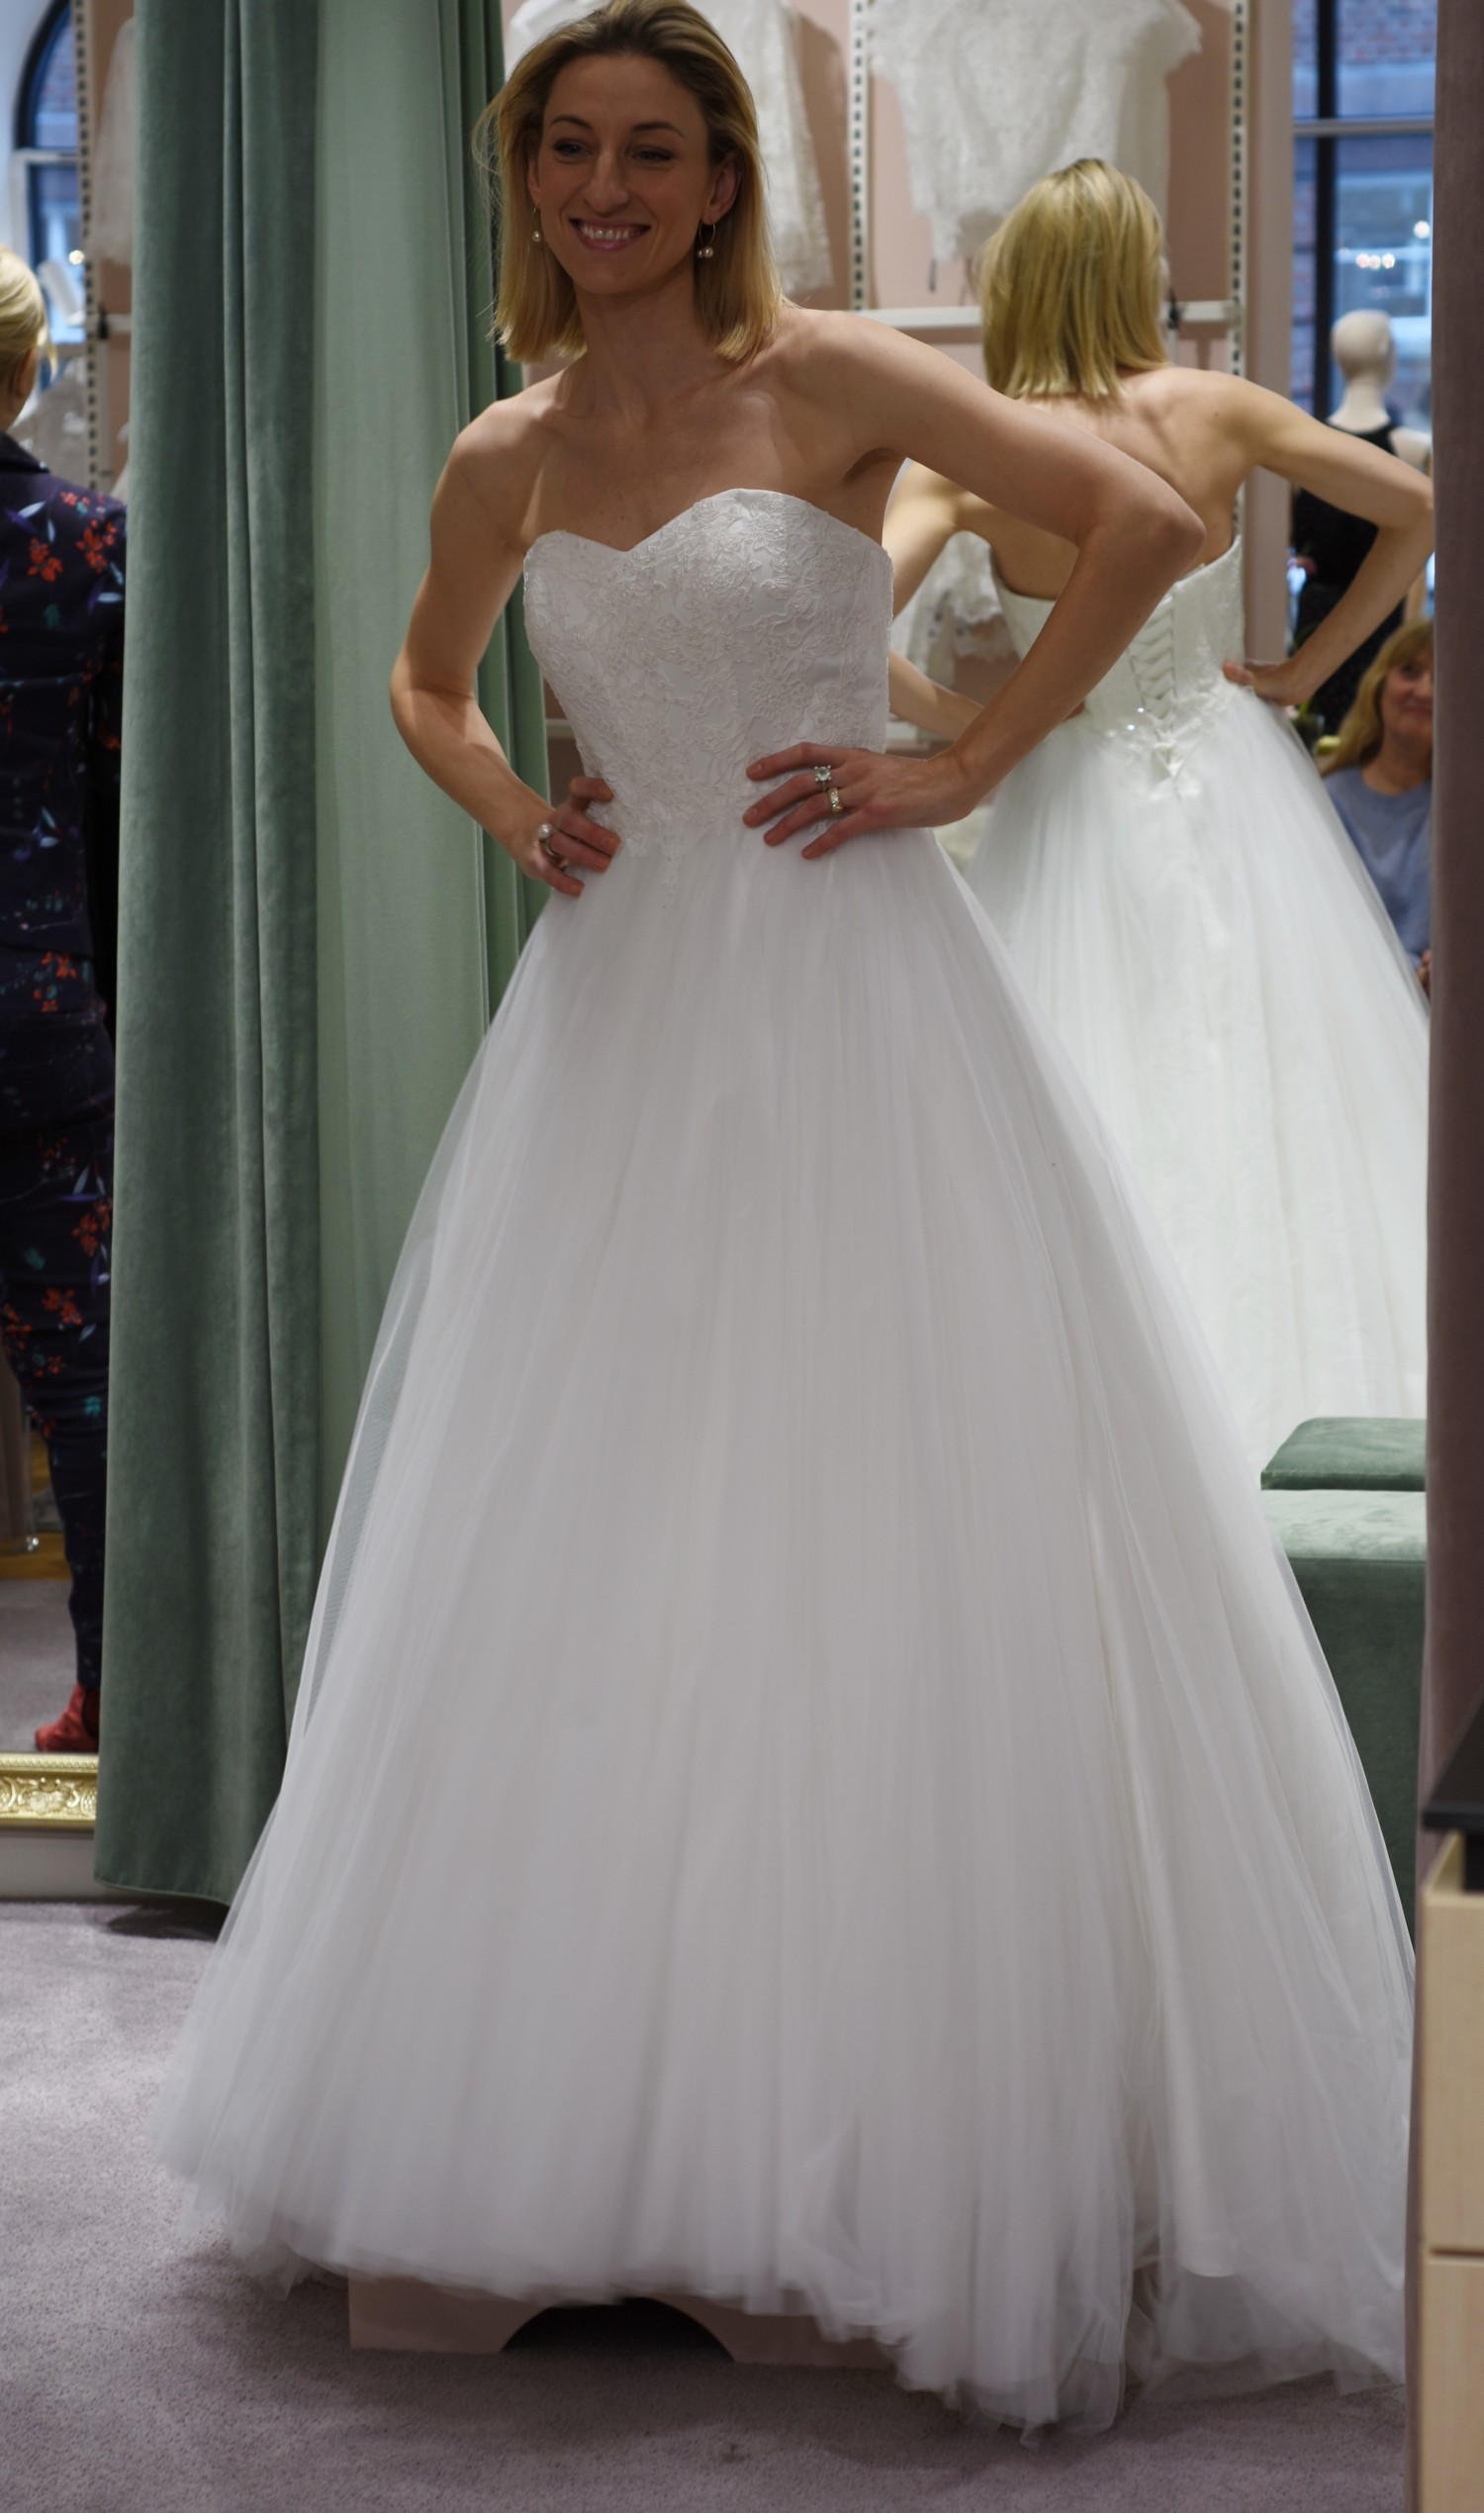 lilly-brudekjoler-annemette-voss-23